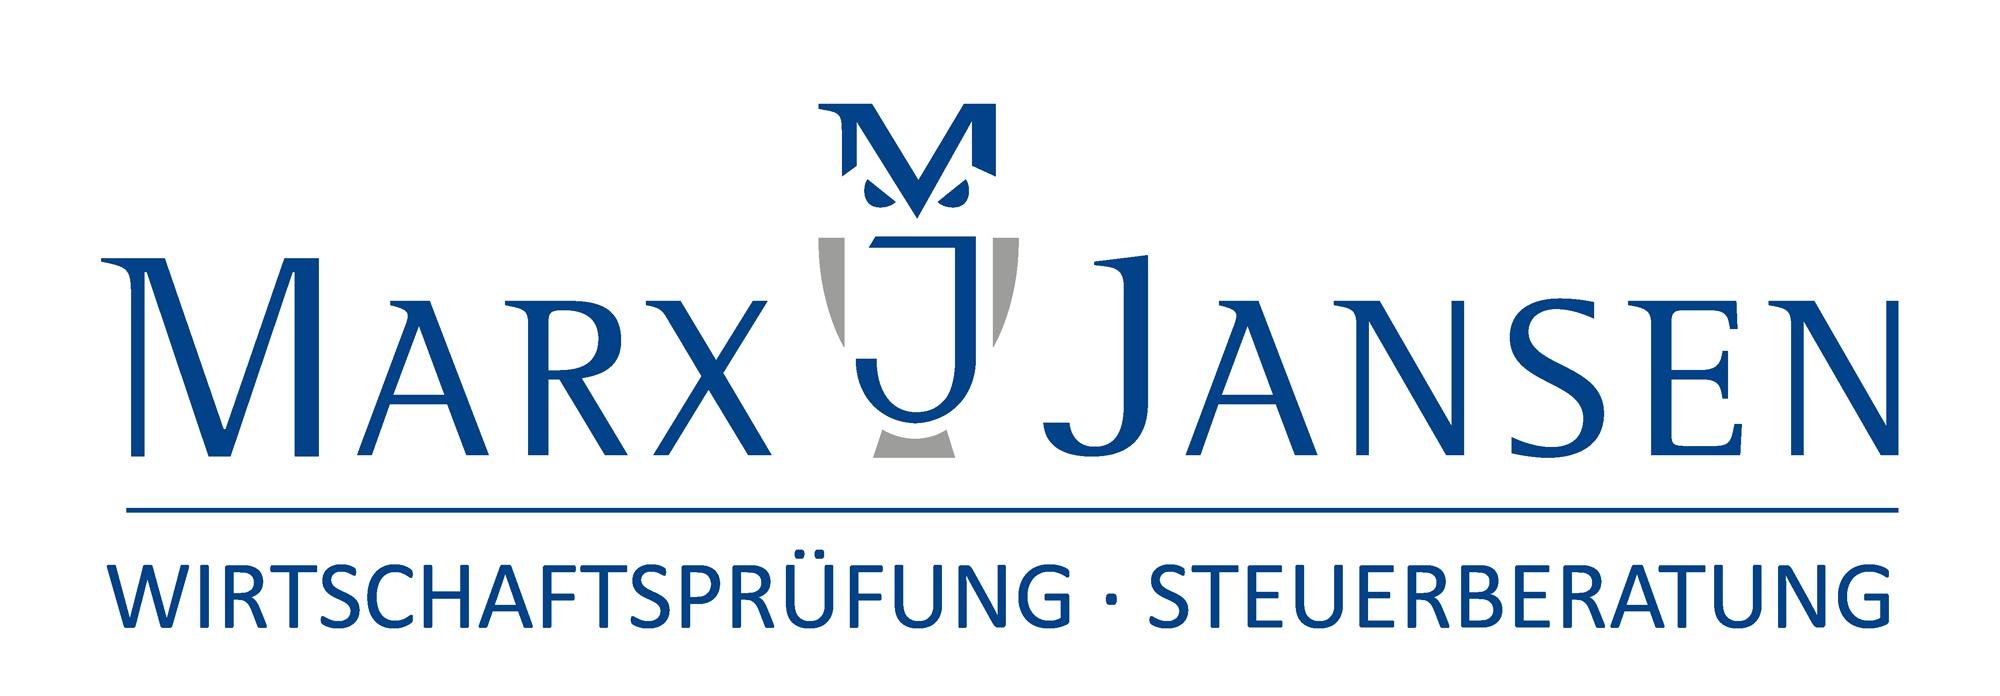 Marx & Jansen